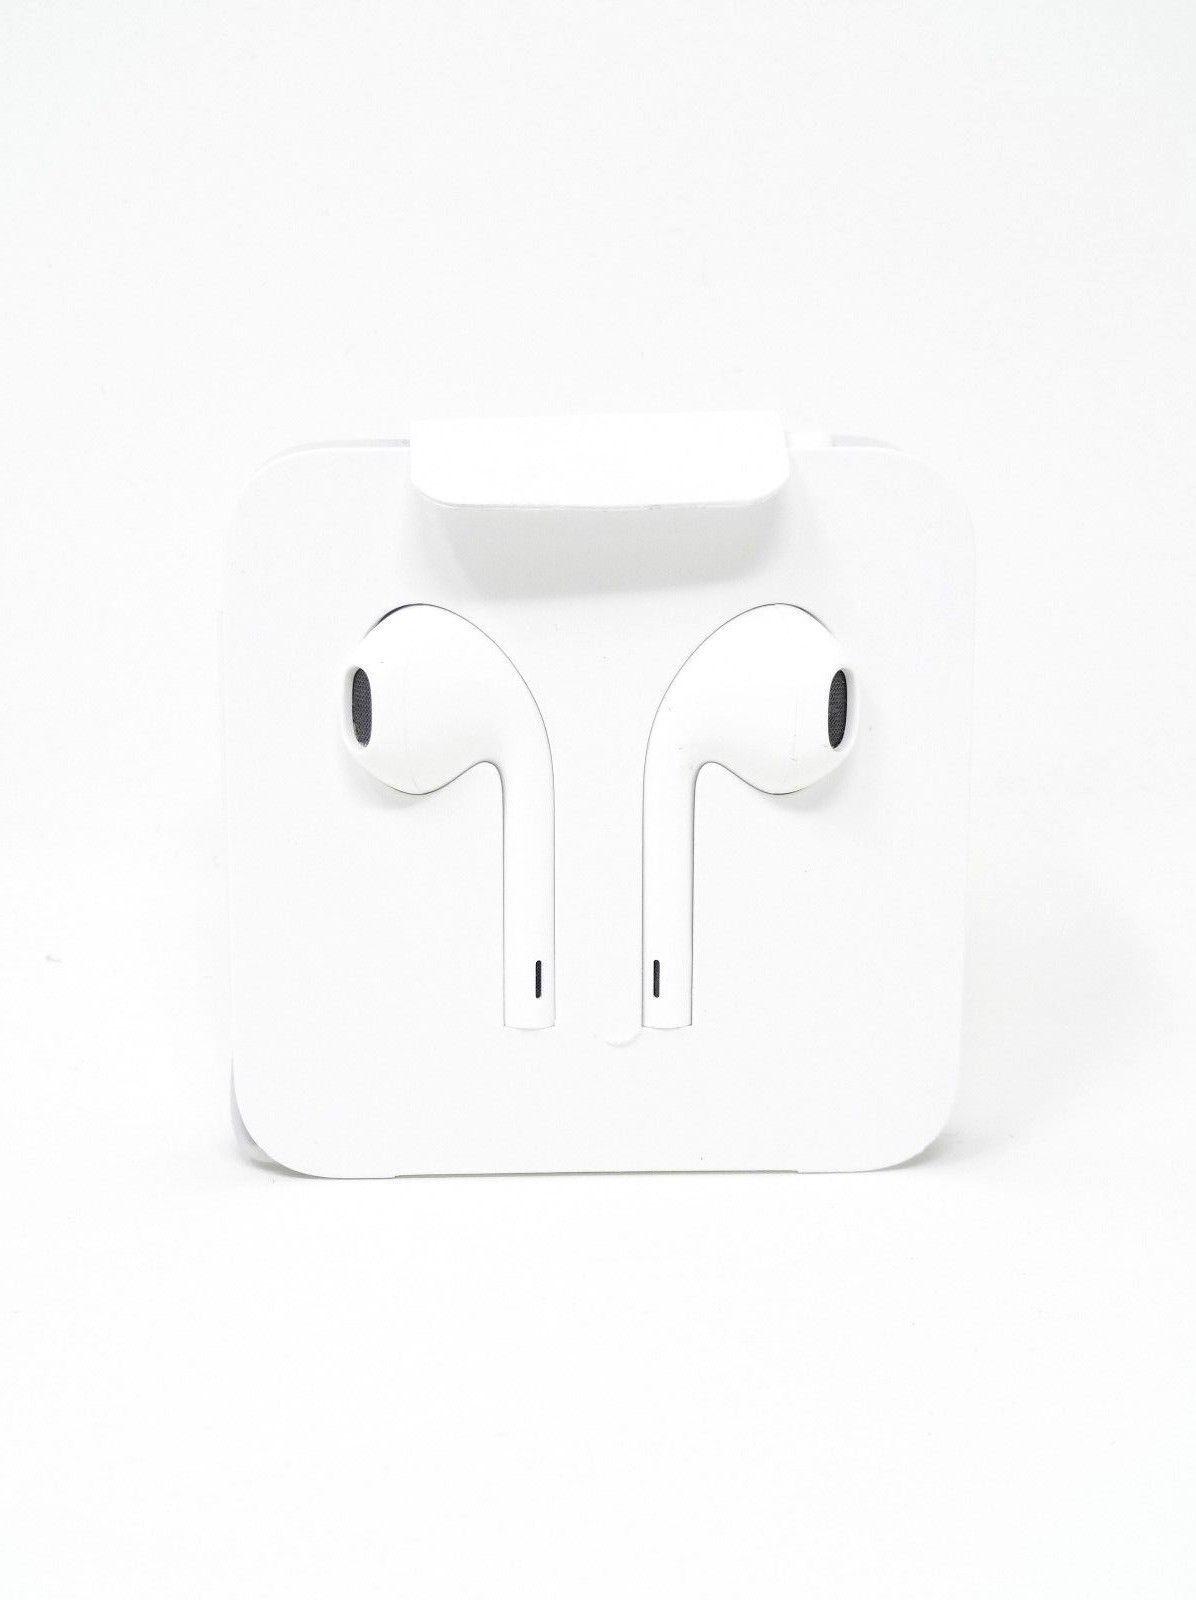 Apple Iphone 7 Plus Iphone 8 Iphone X Original Oem Earbuds Headphones Lightning Apple Iphone Iphone Headphones Earbuds